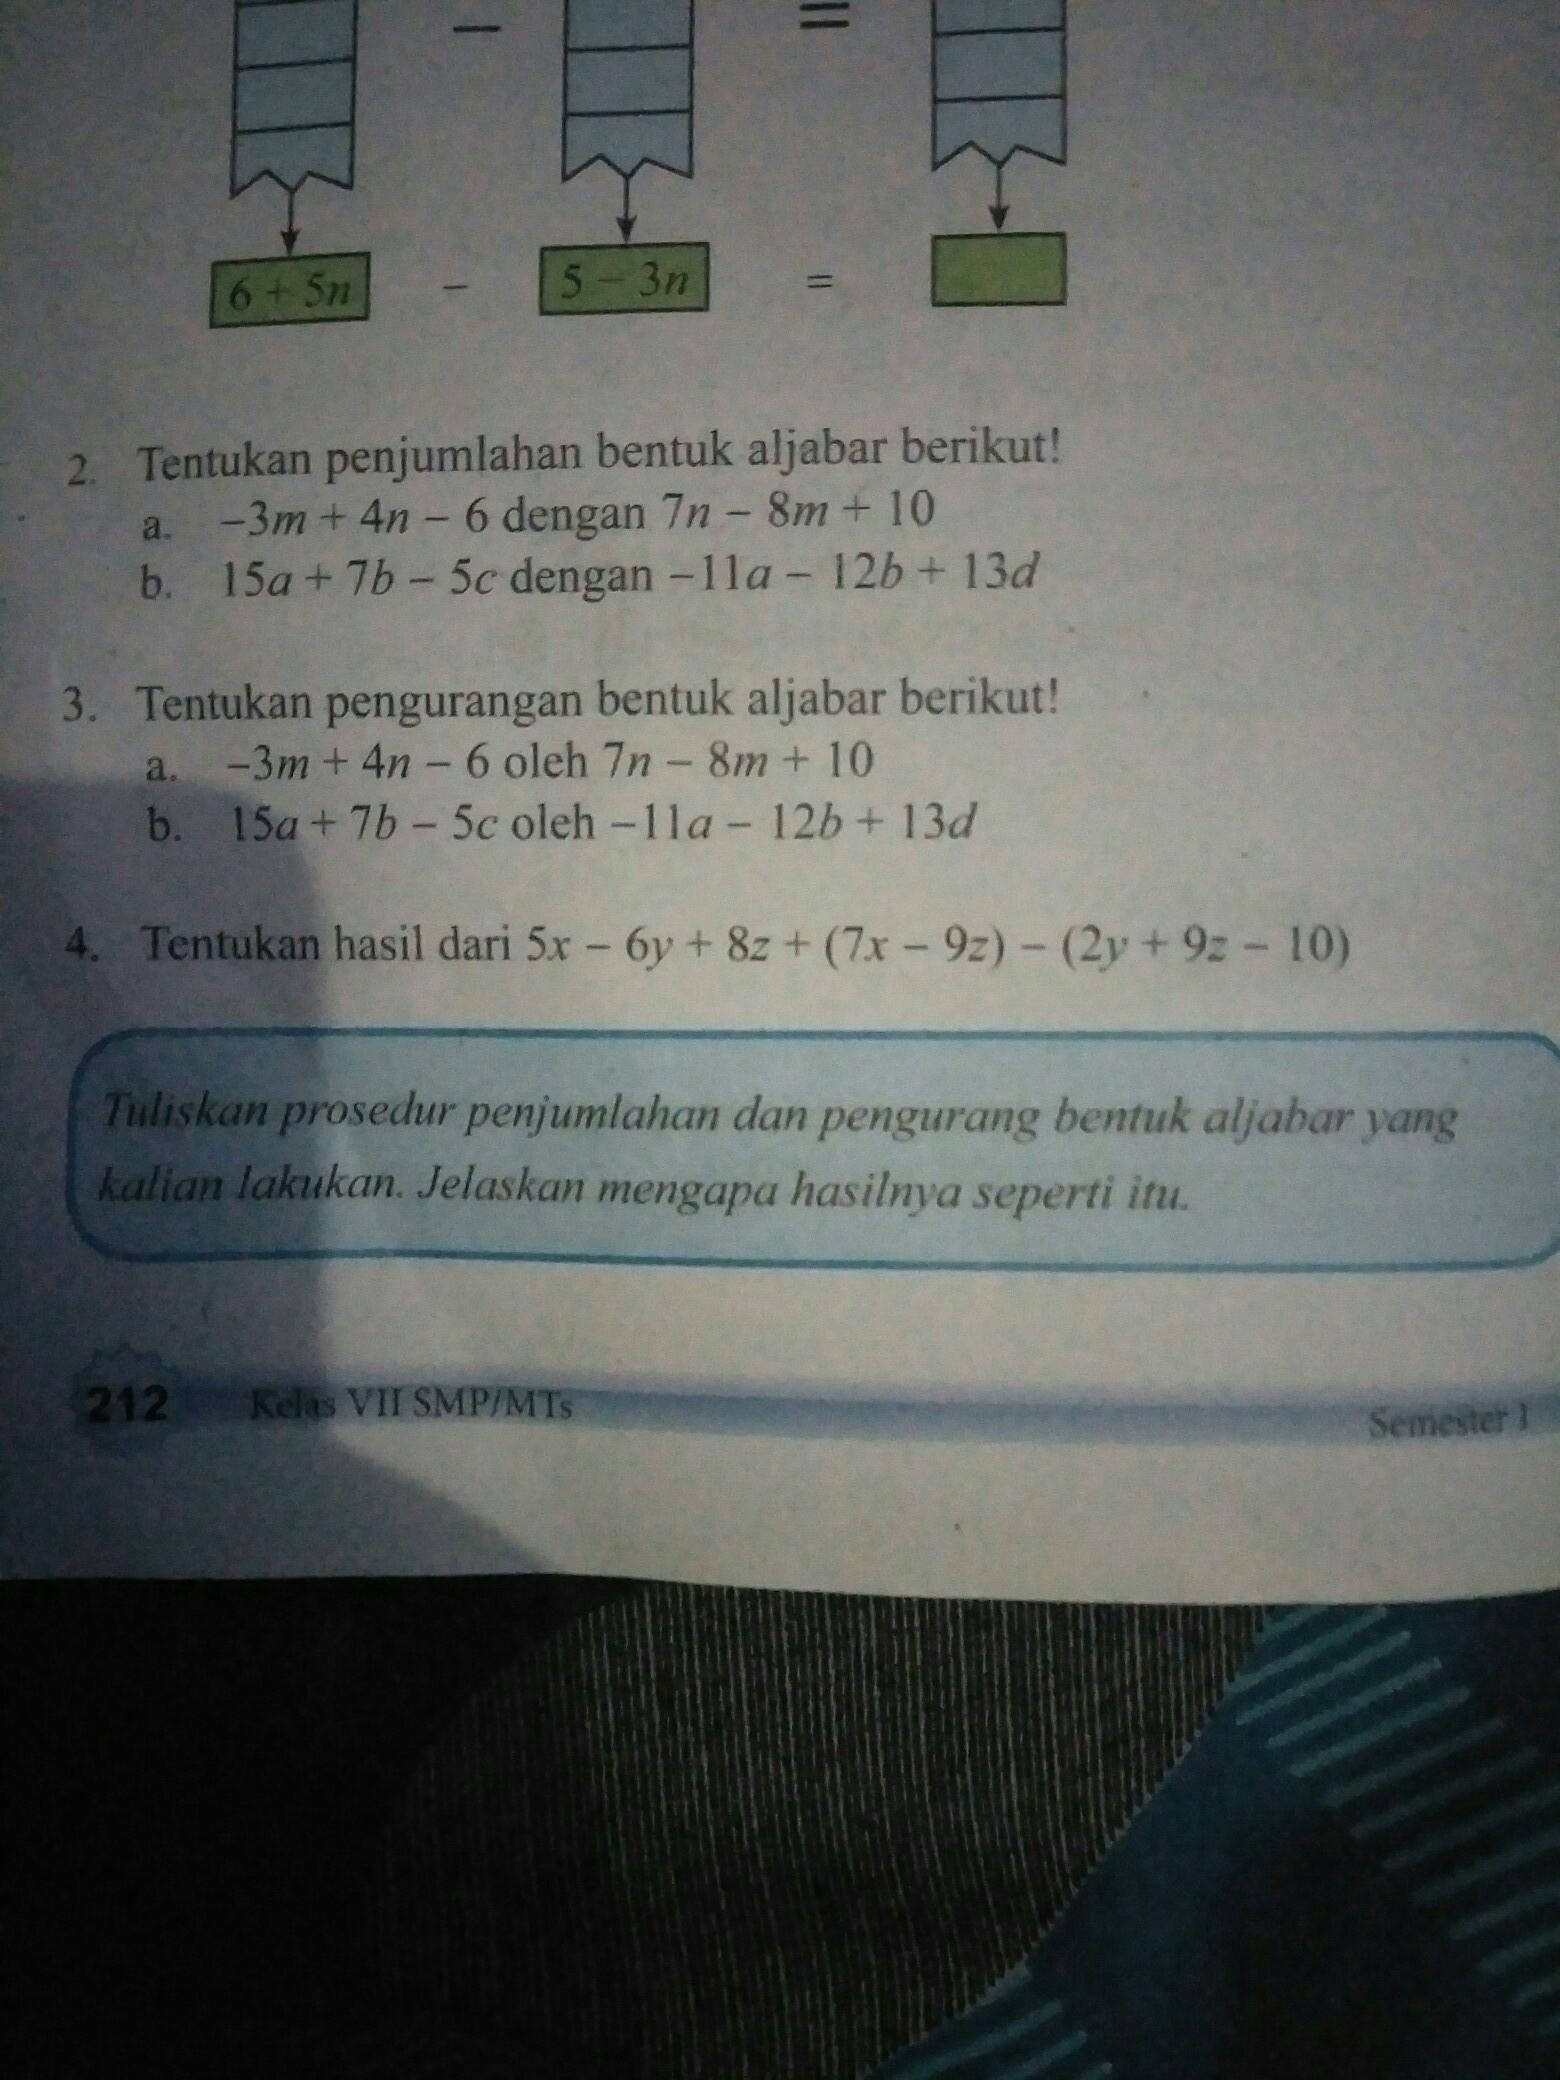 Tugas Bahasa Indonesia Kls 11 Paket Hal 153